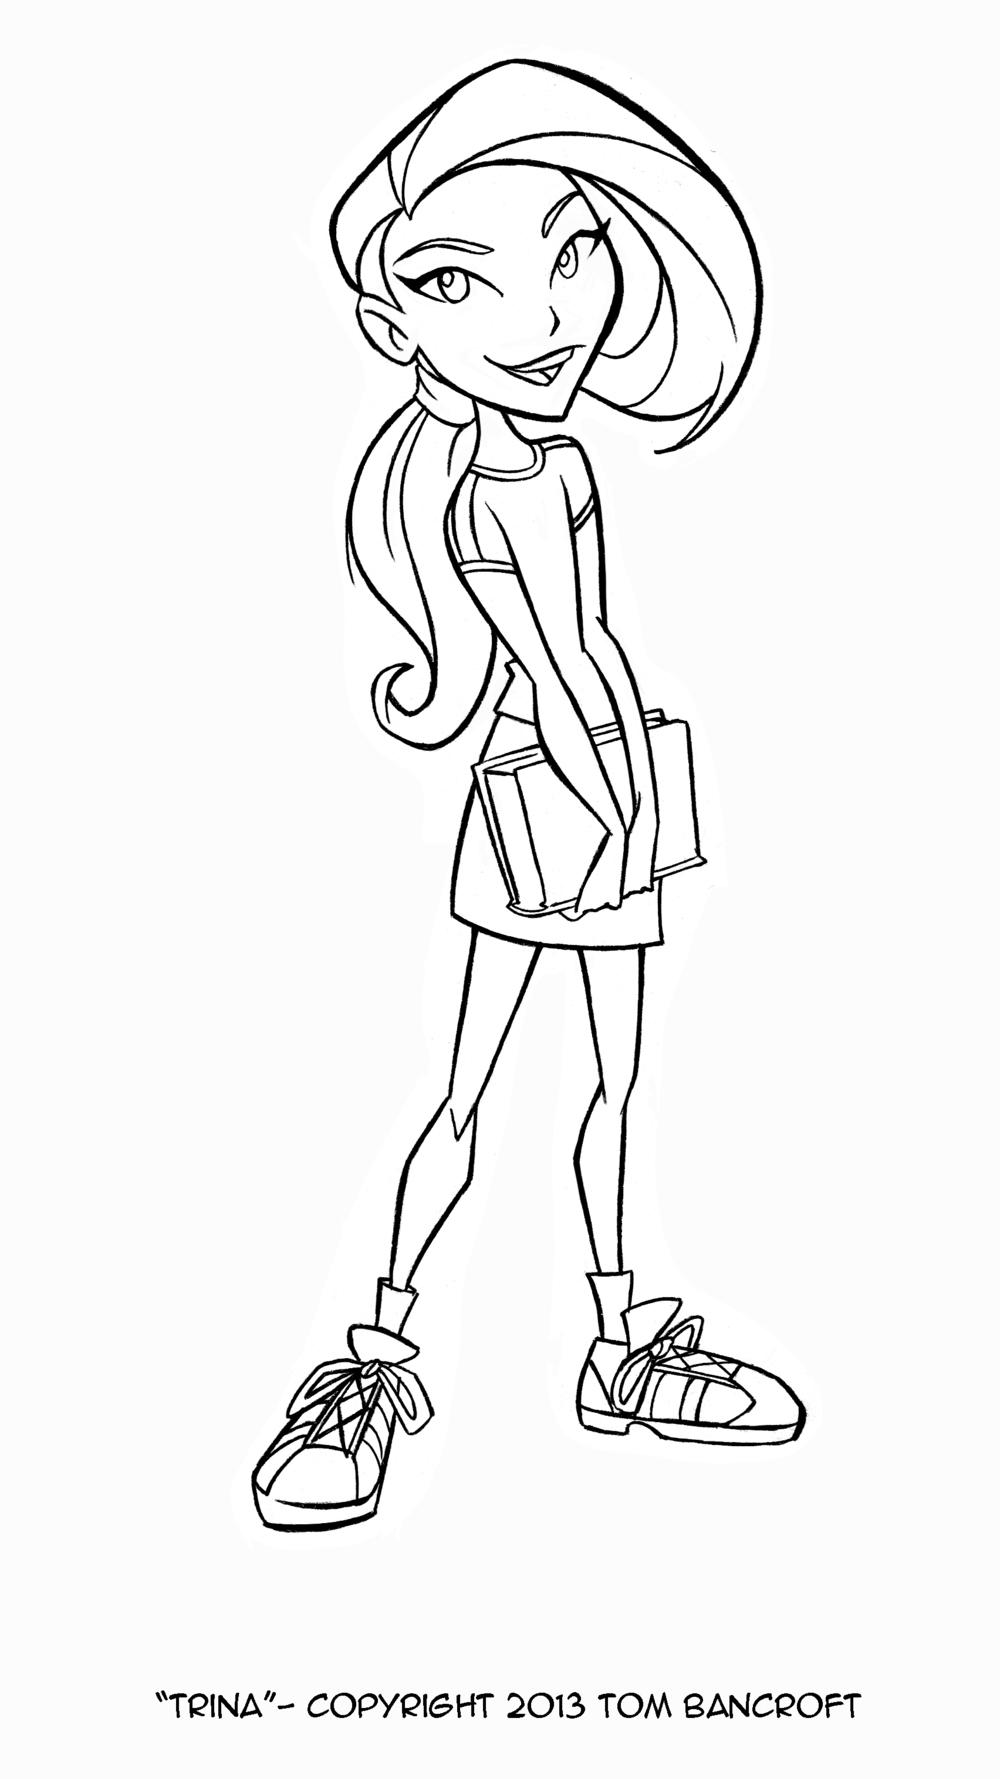 Trina_characterdesign_bancroft.jpg